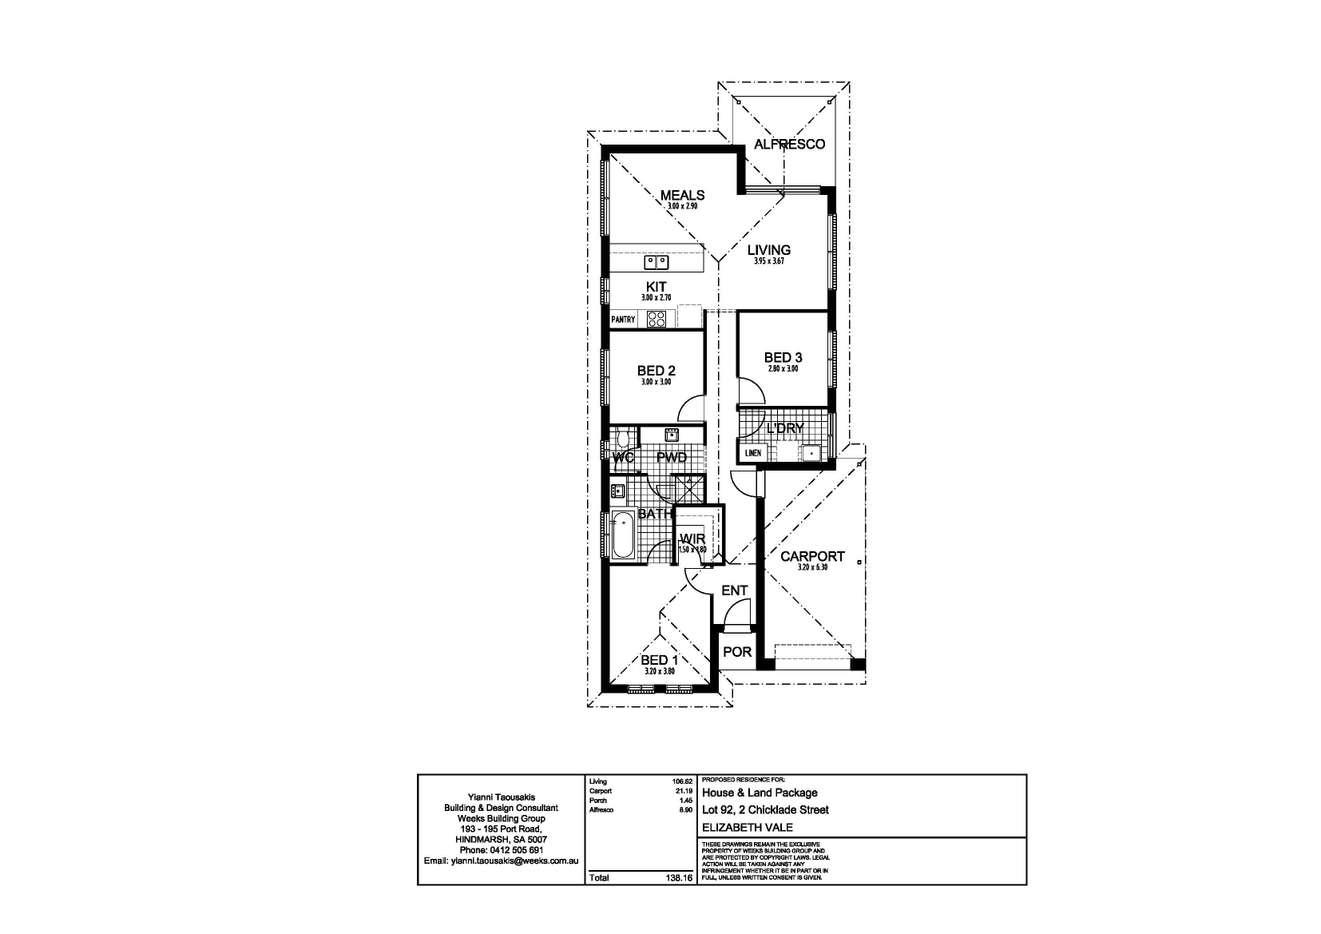 Lot 92, 2 Chicklade Street, Elizabeth Vale, SA 5112